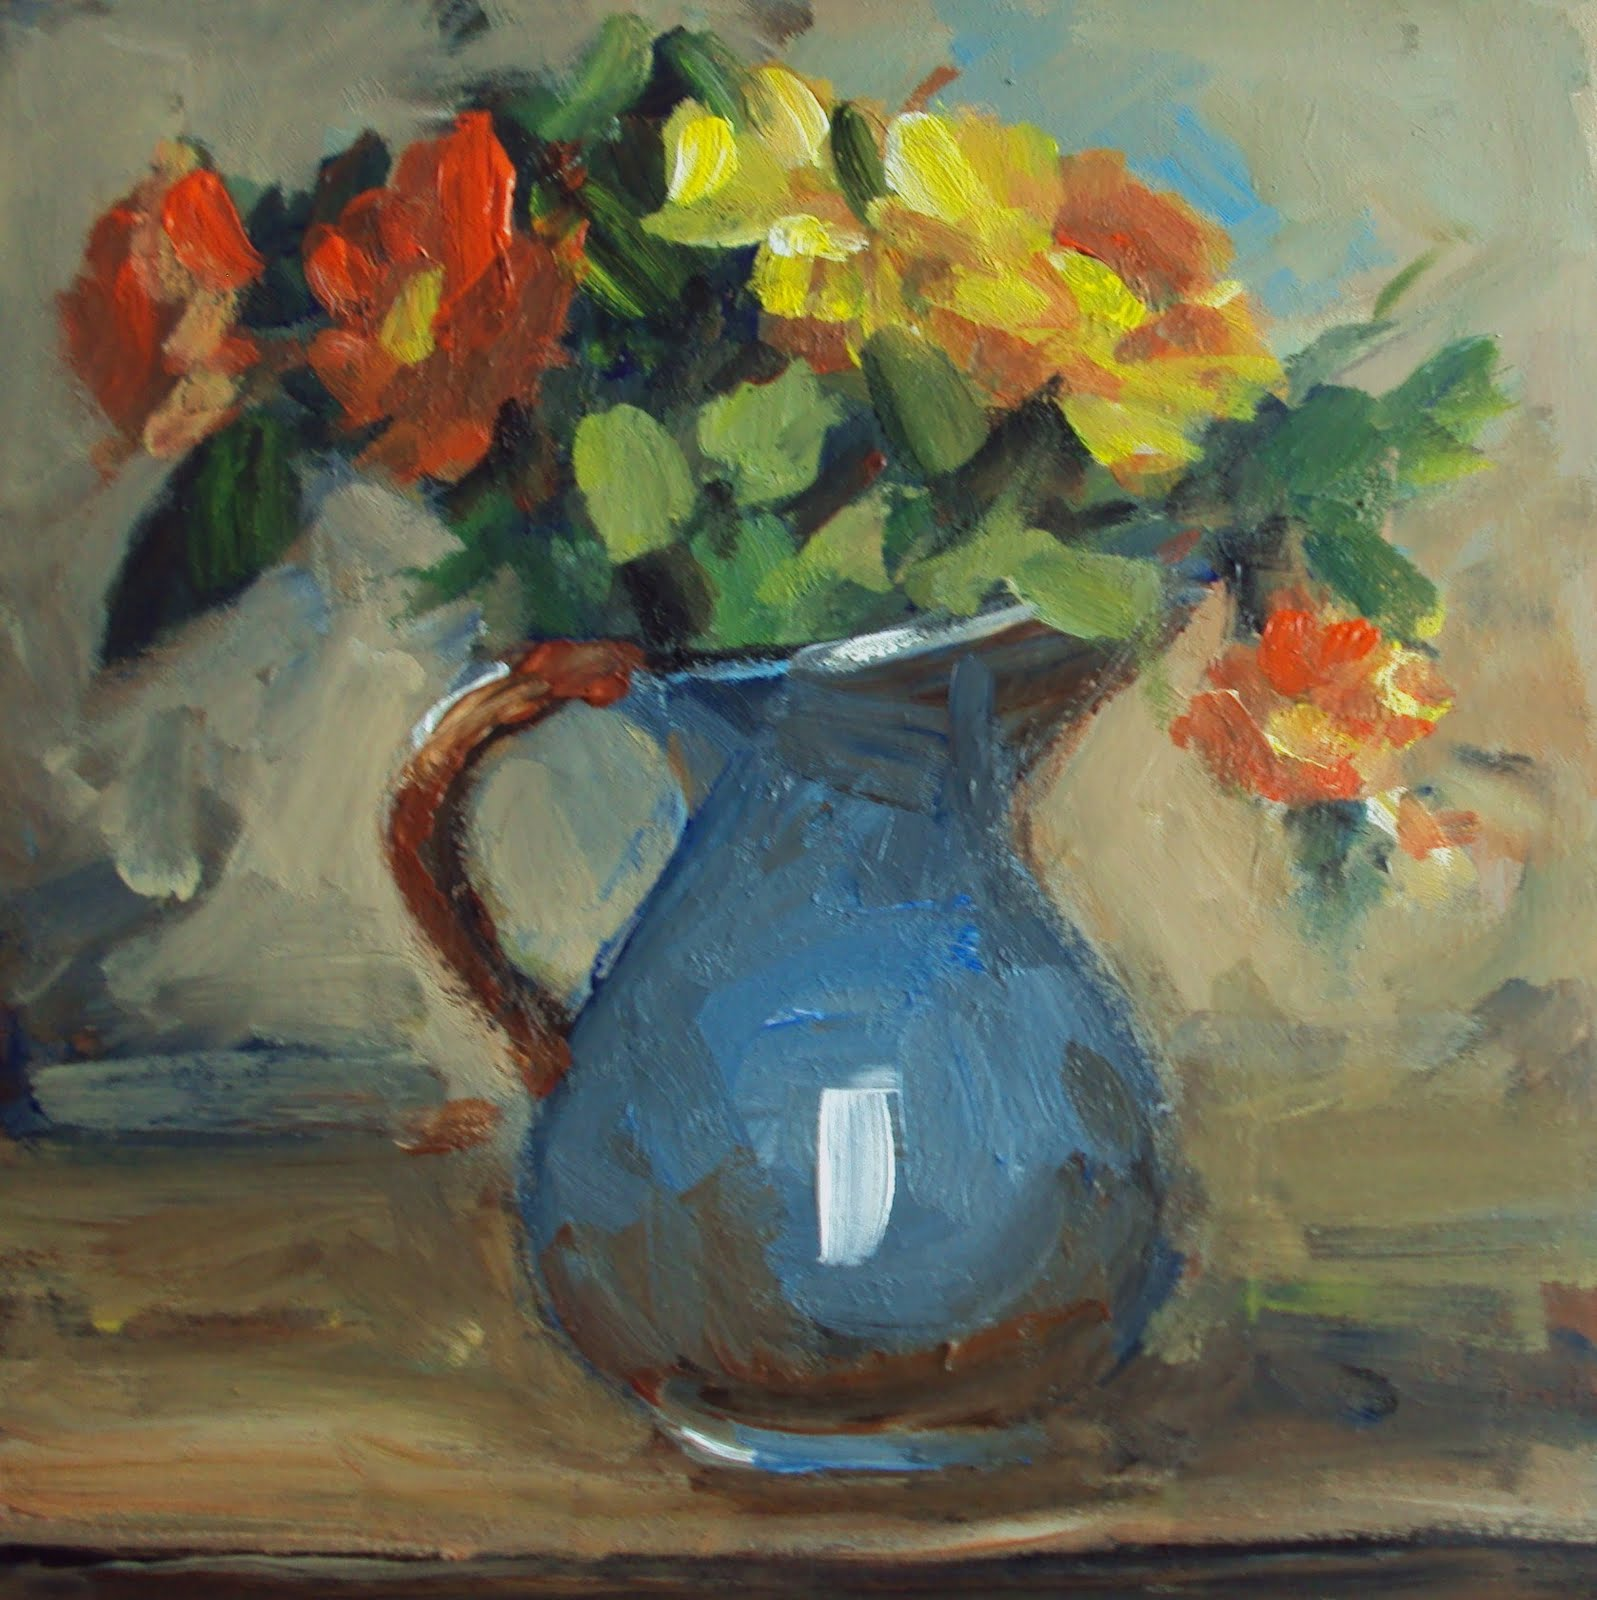 """daisy in a blue jug"" original fine art by Parastoo Ganjei"